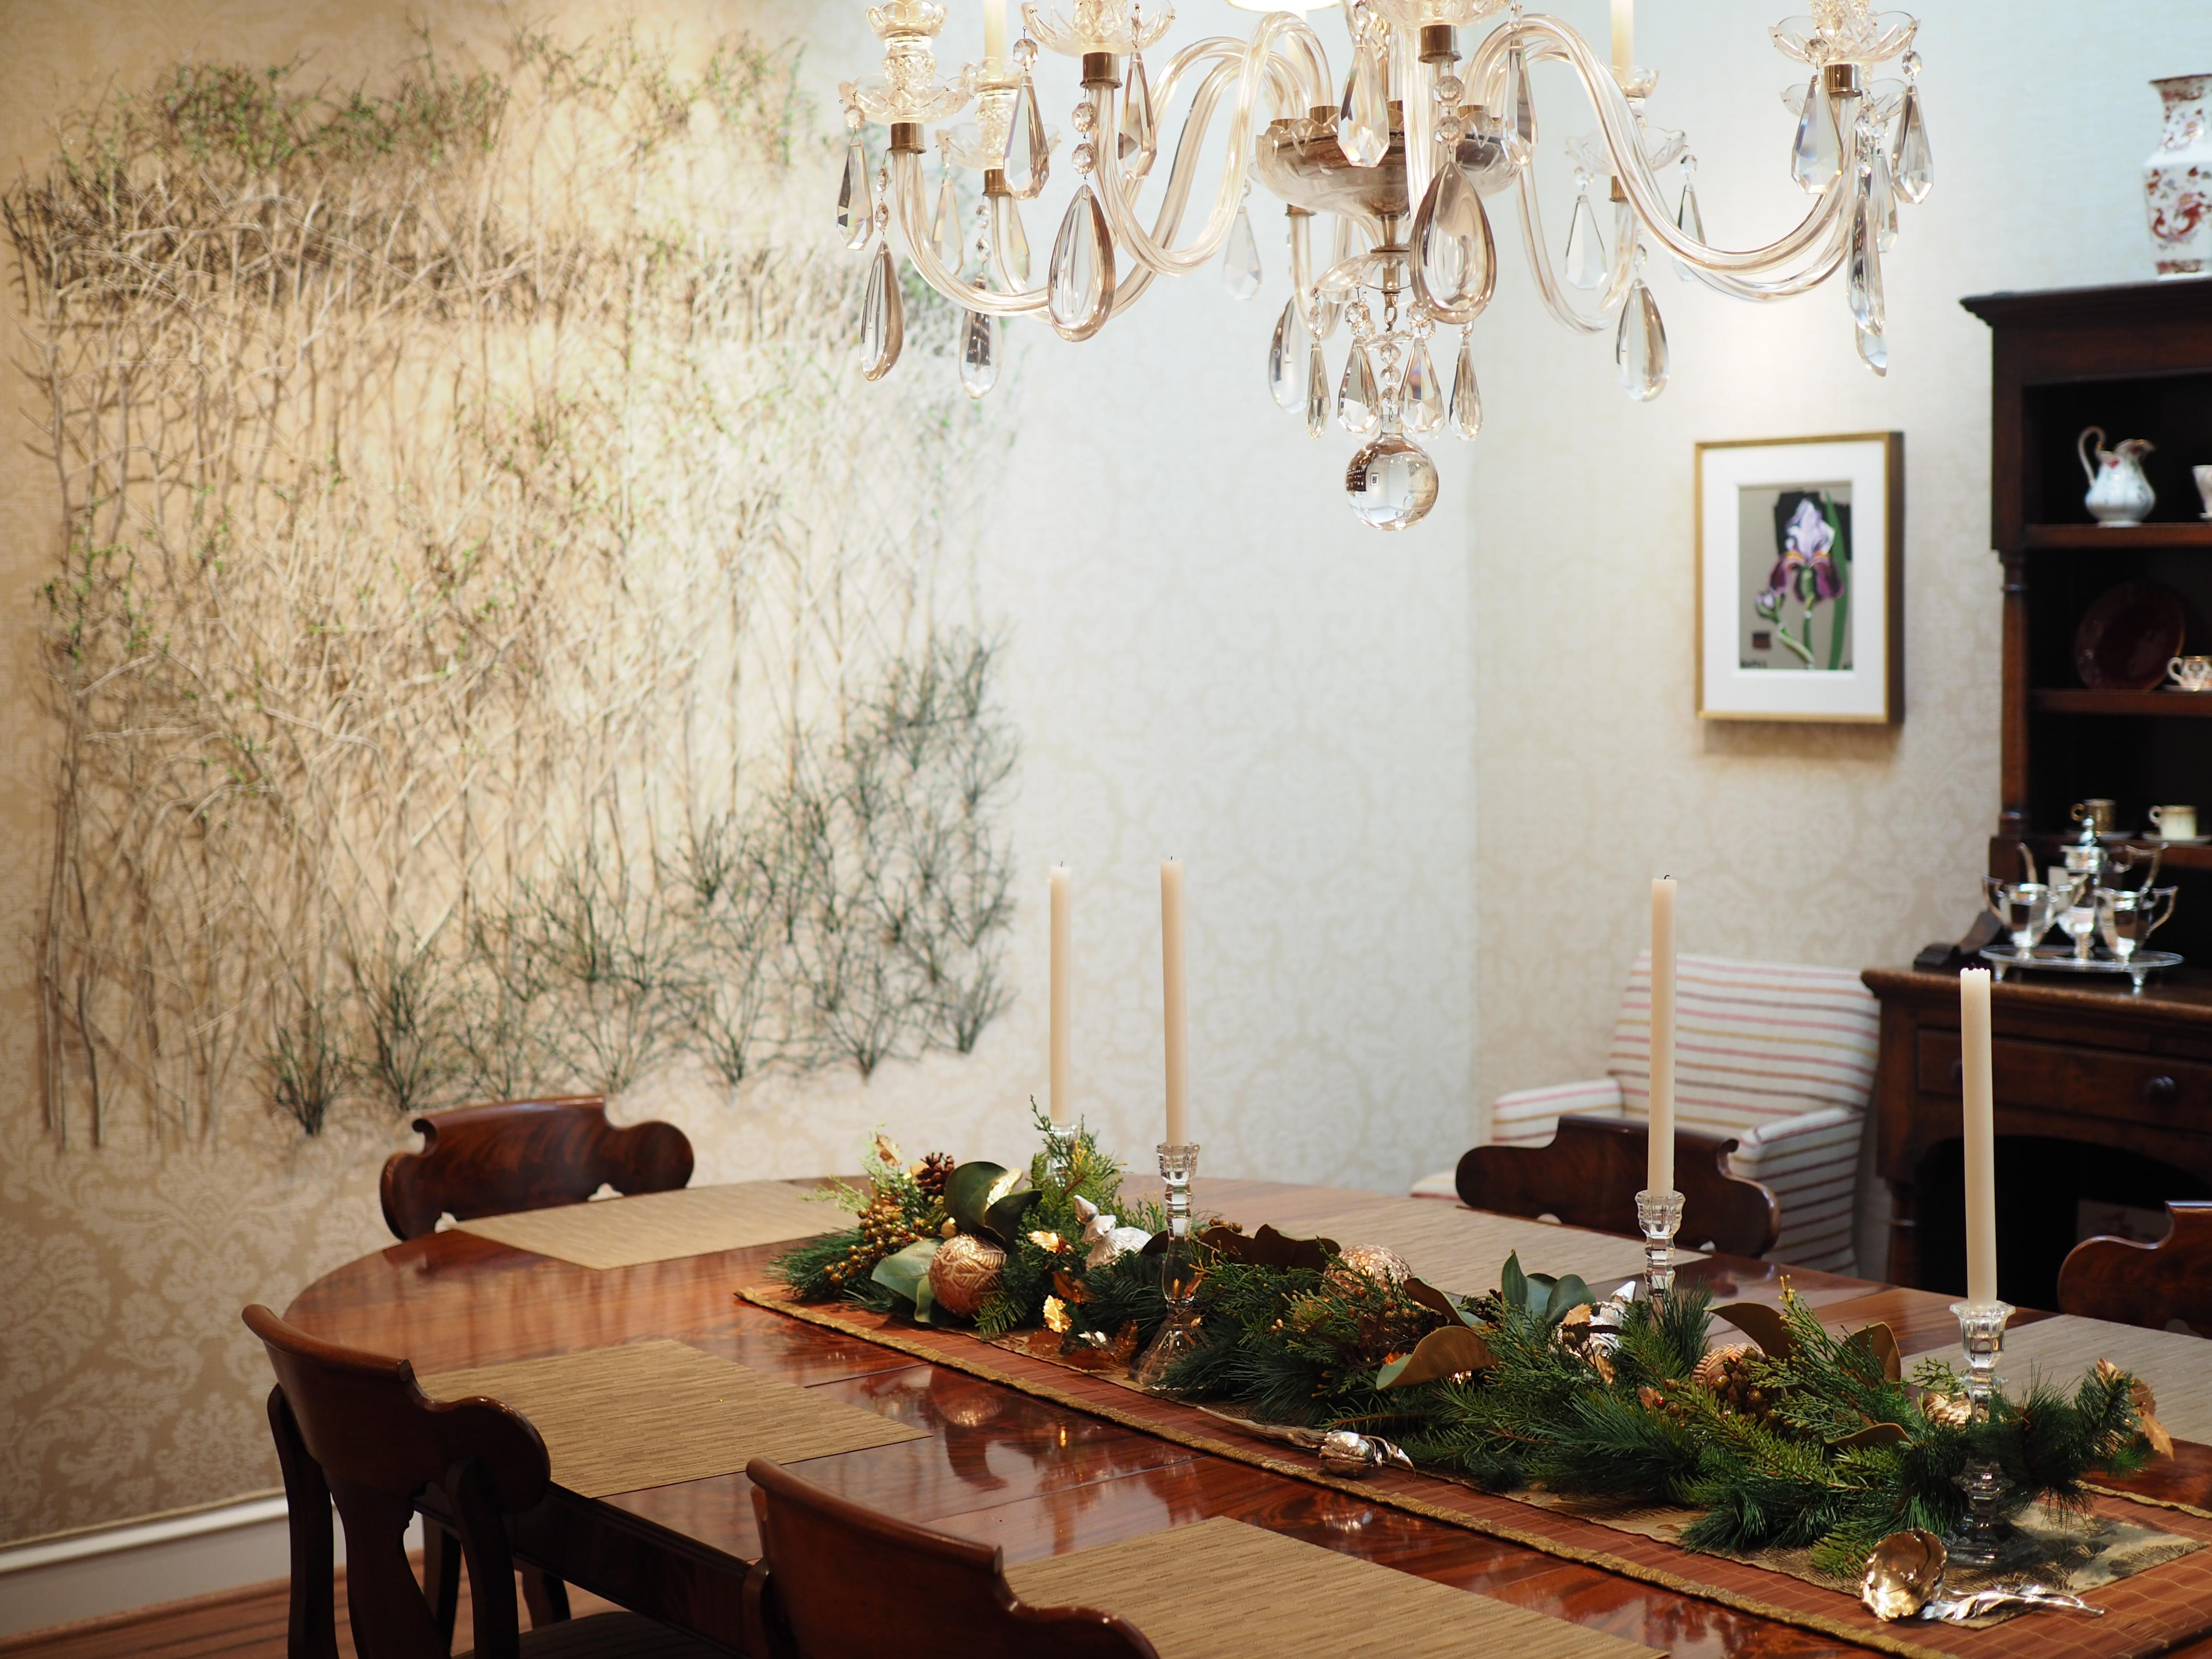 Minimal Dining Room Centerpiece